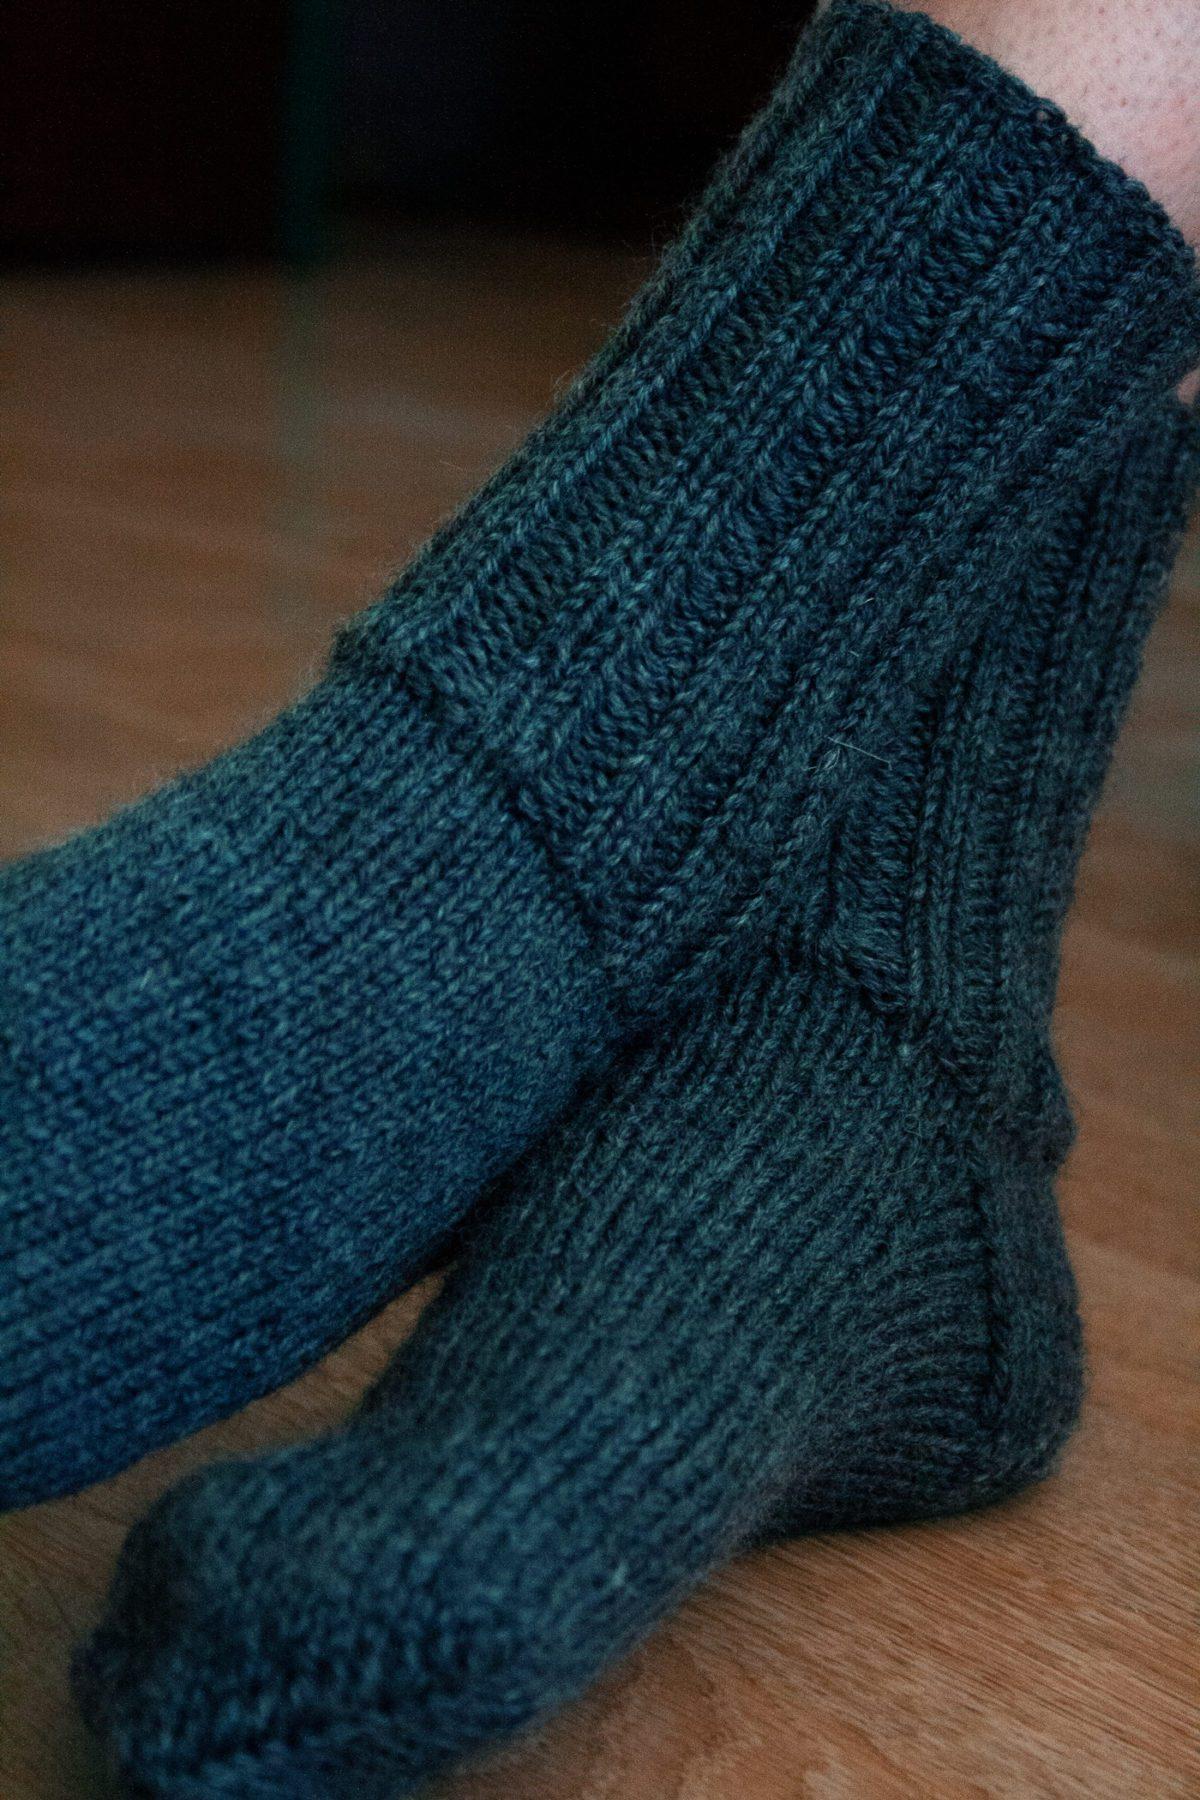 Hand knit wool socks close up